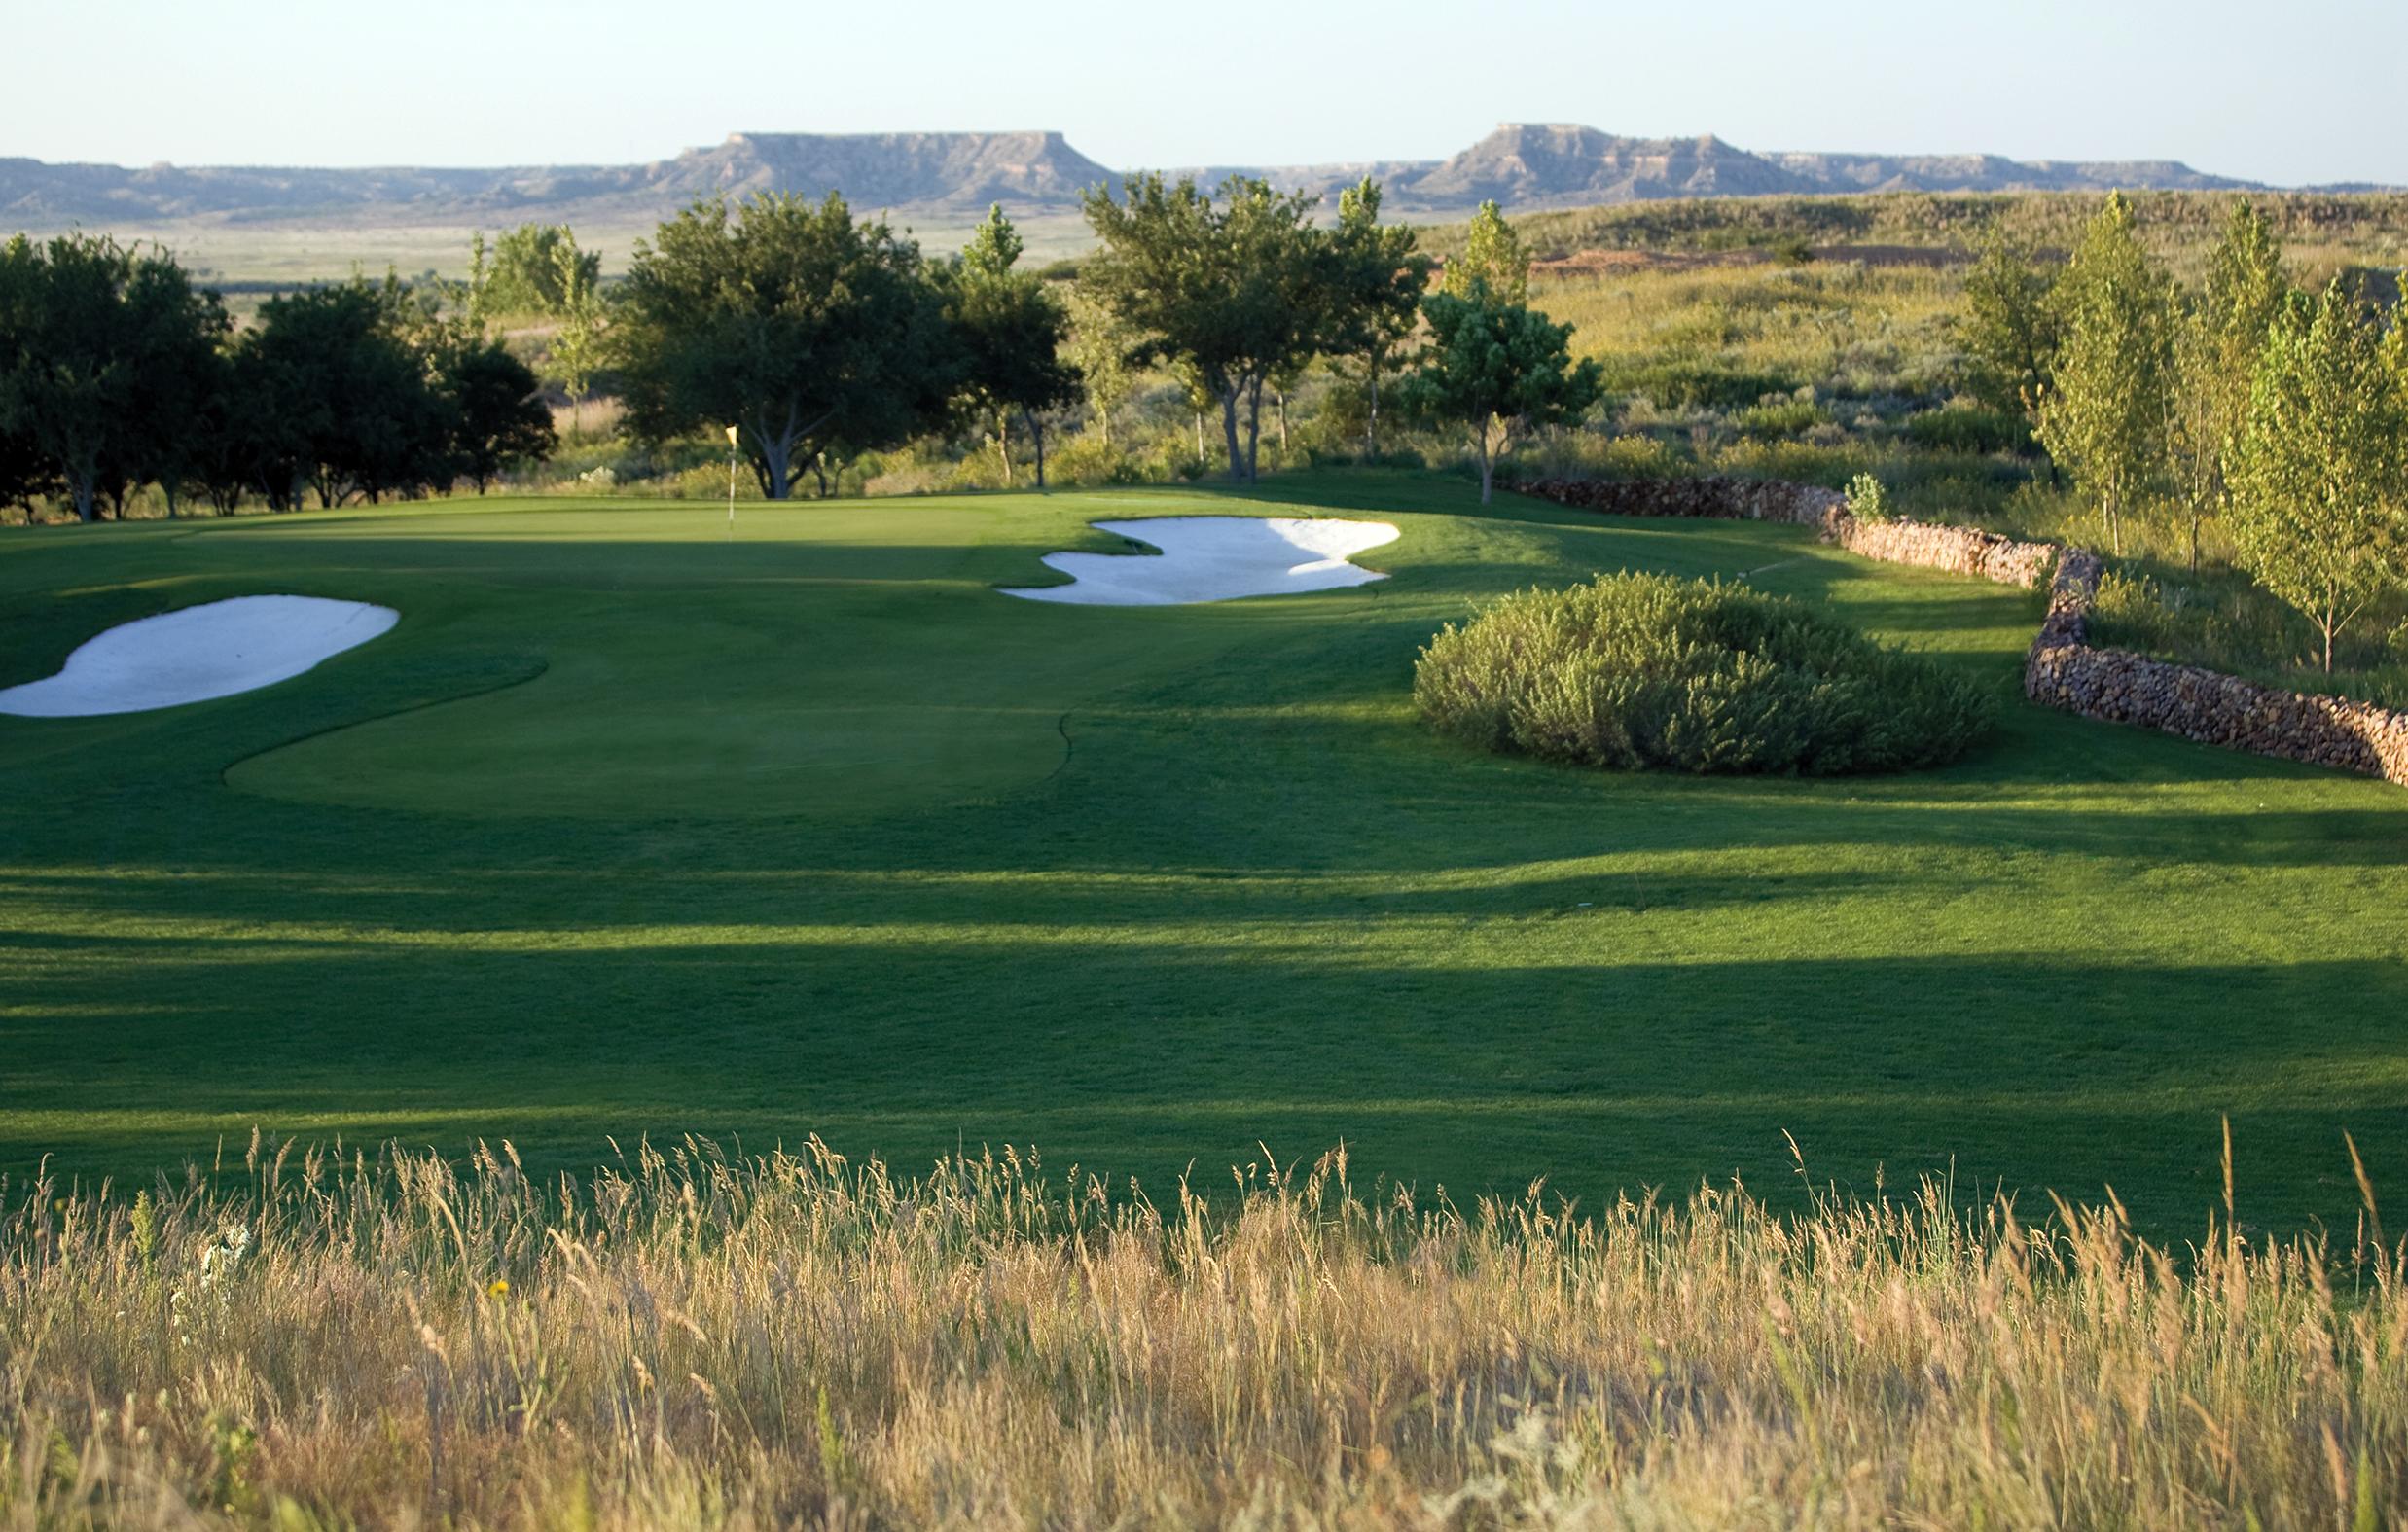 171204-t-boone-pickens-mesa-vista-ranch-14